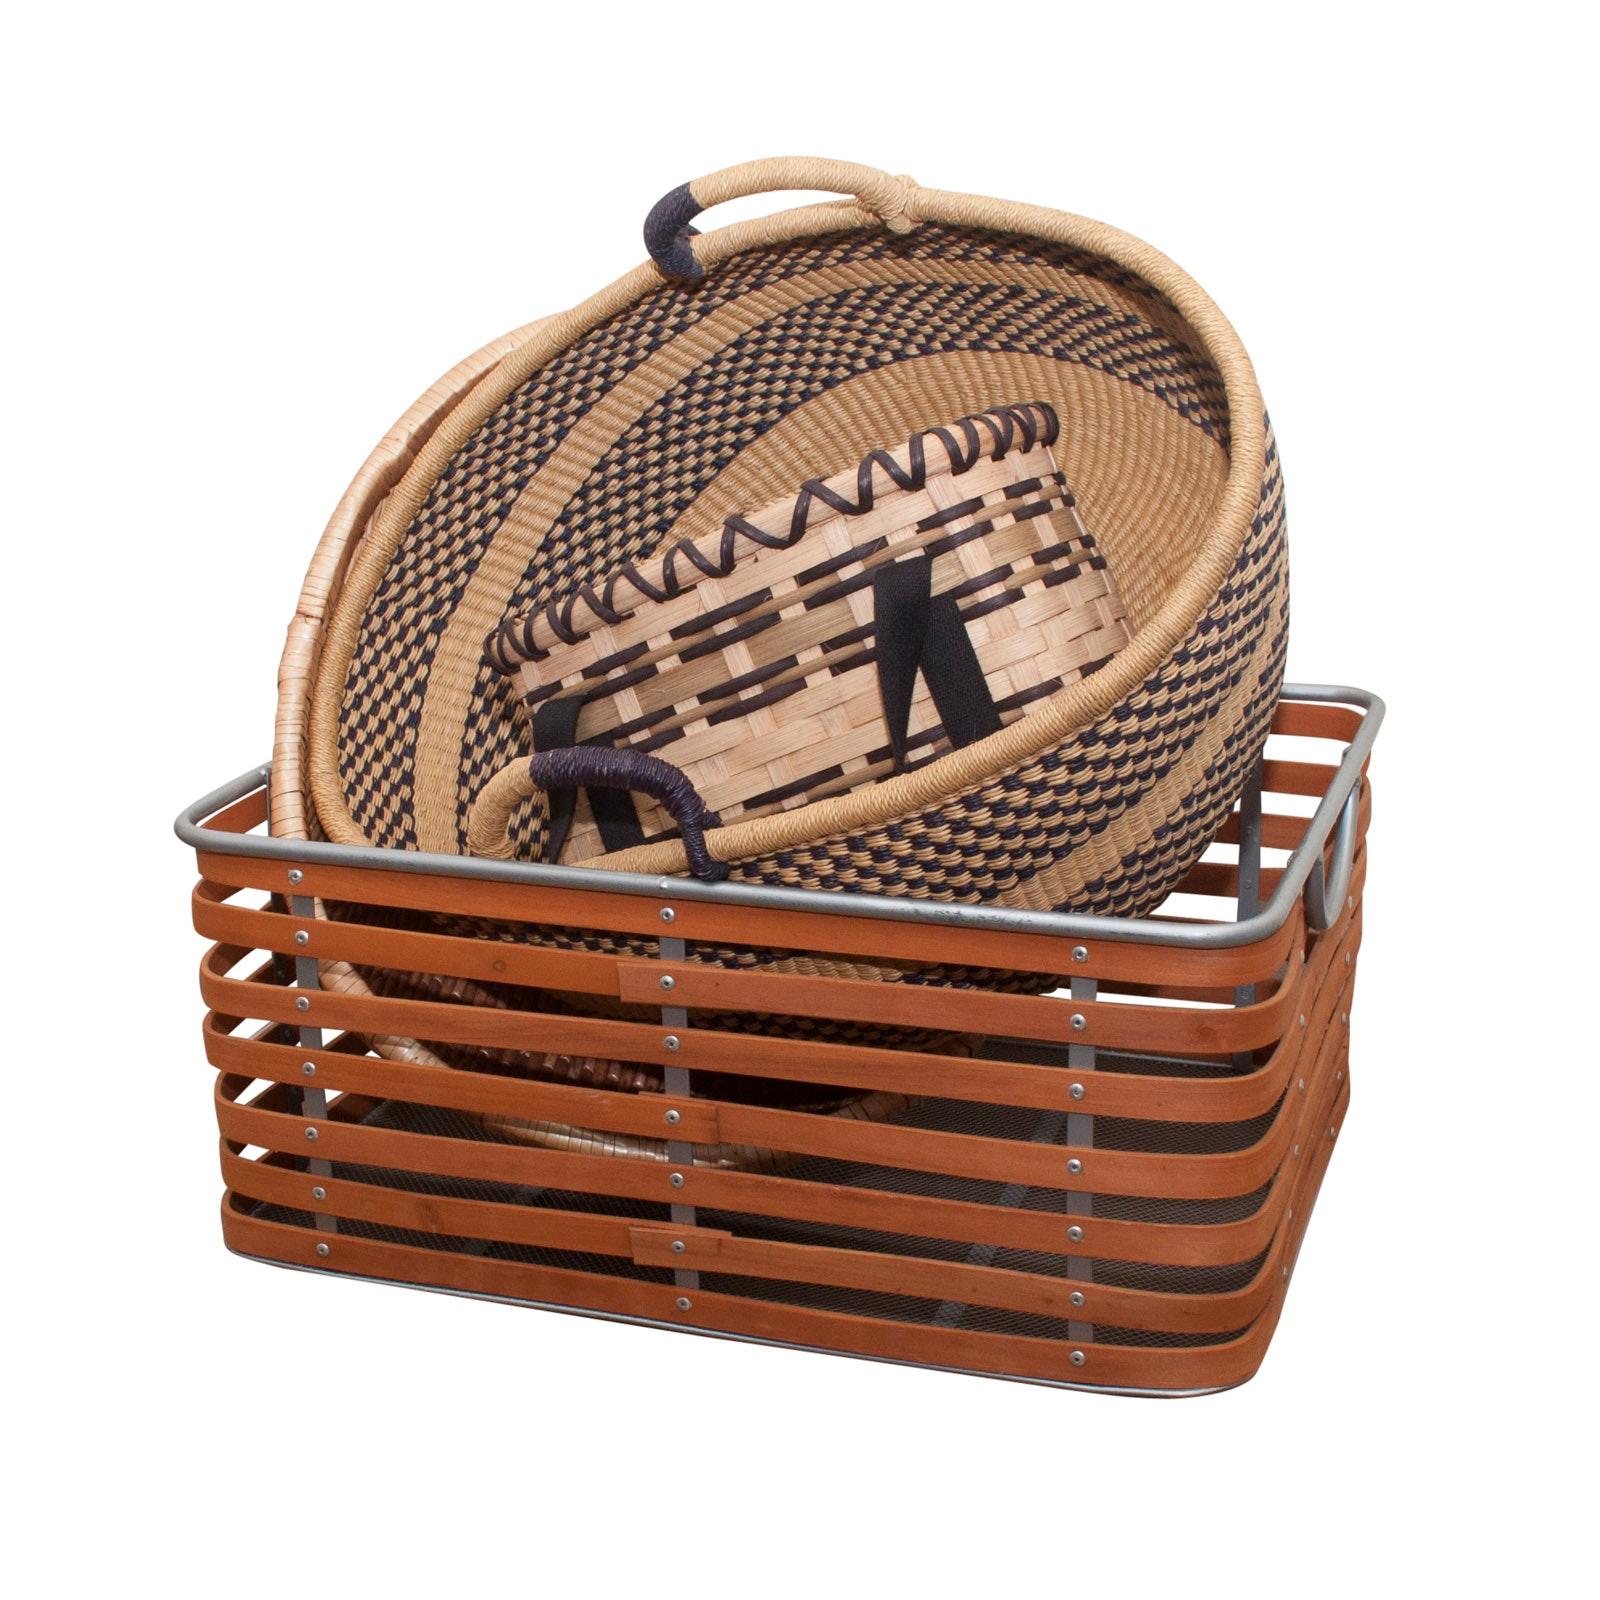 Woven Basket Group